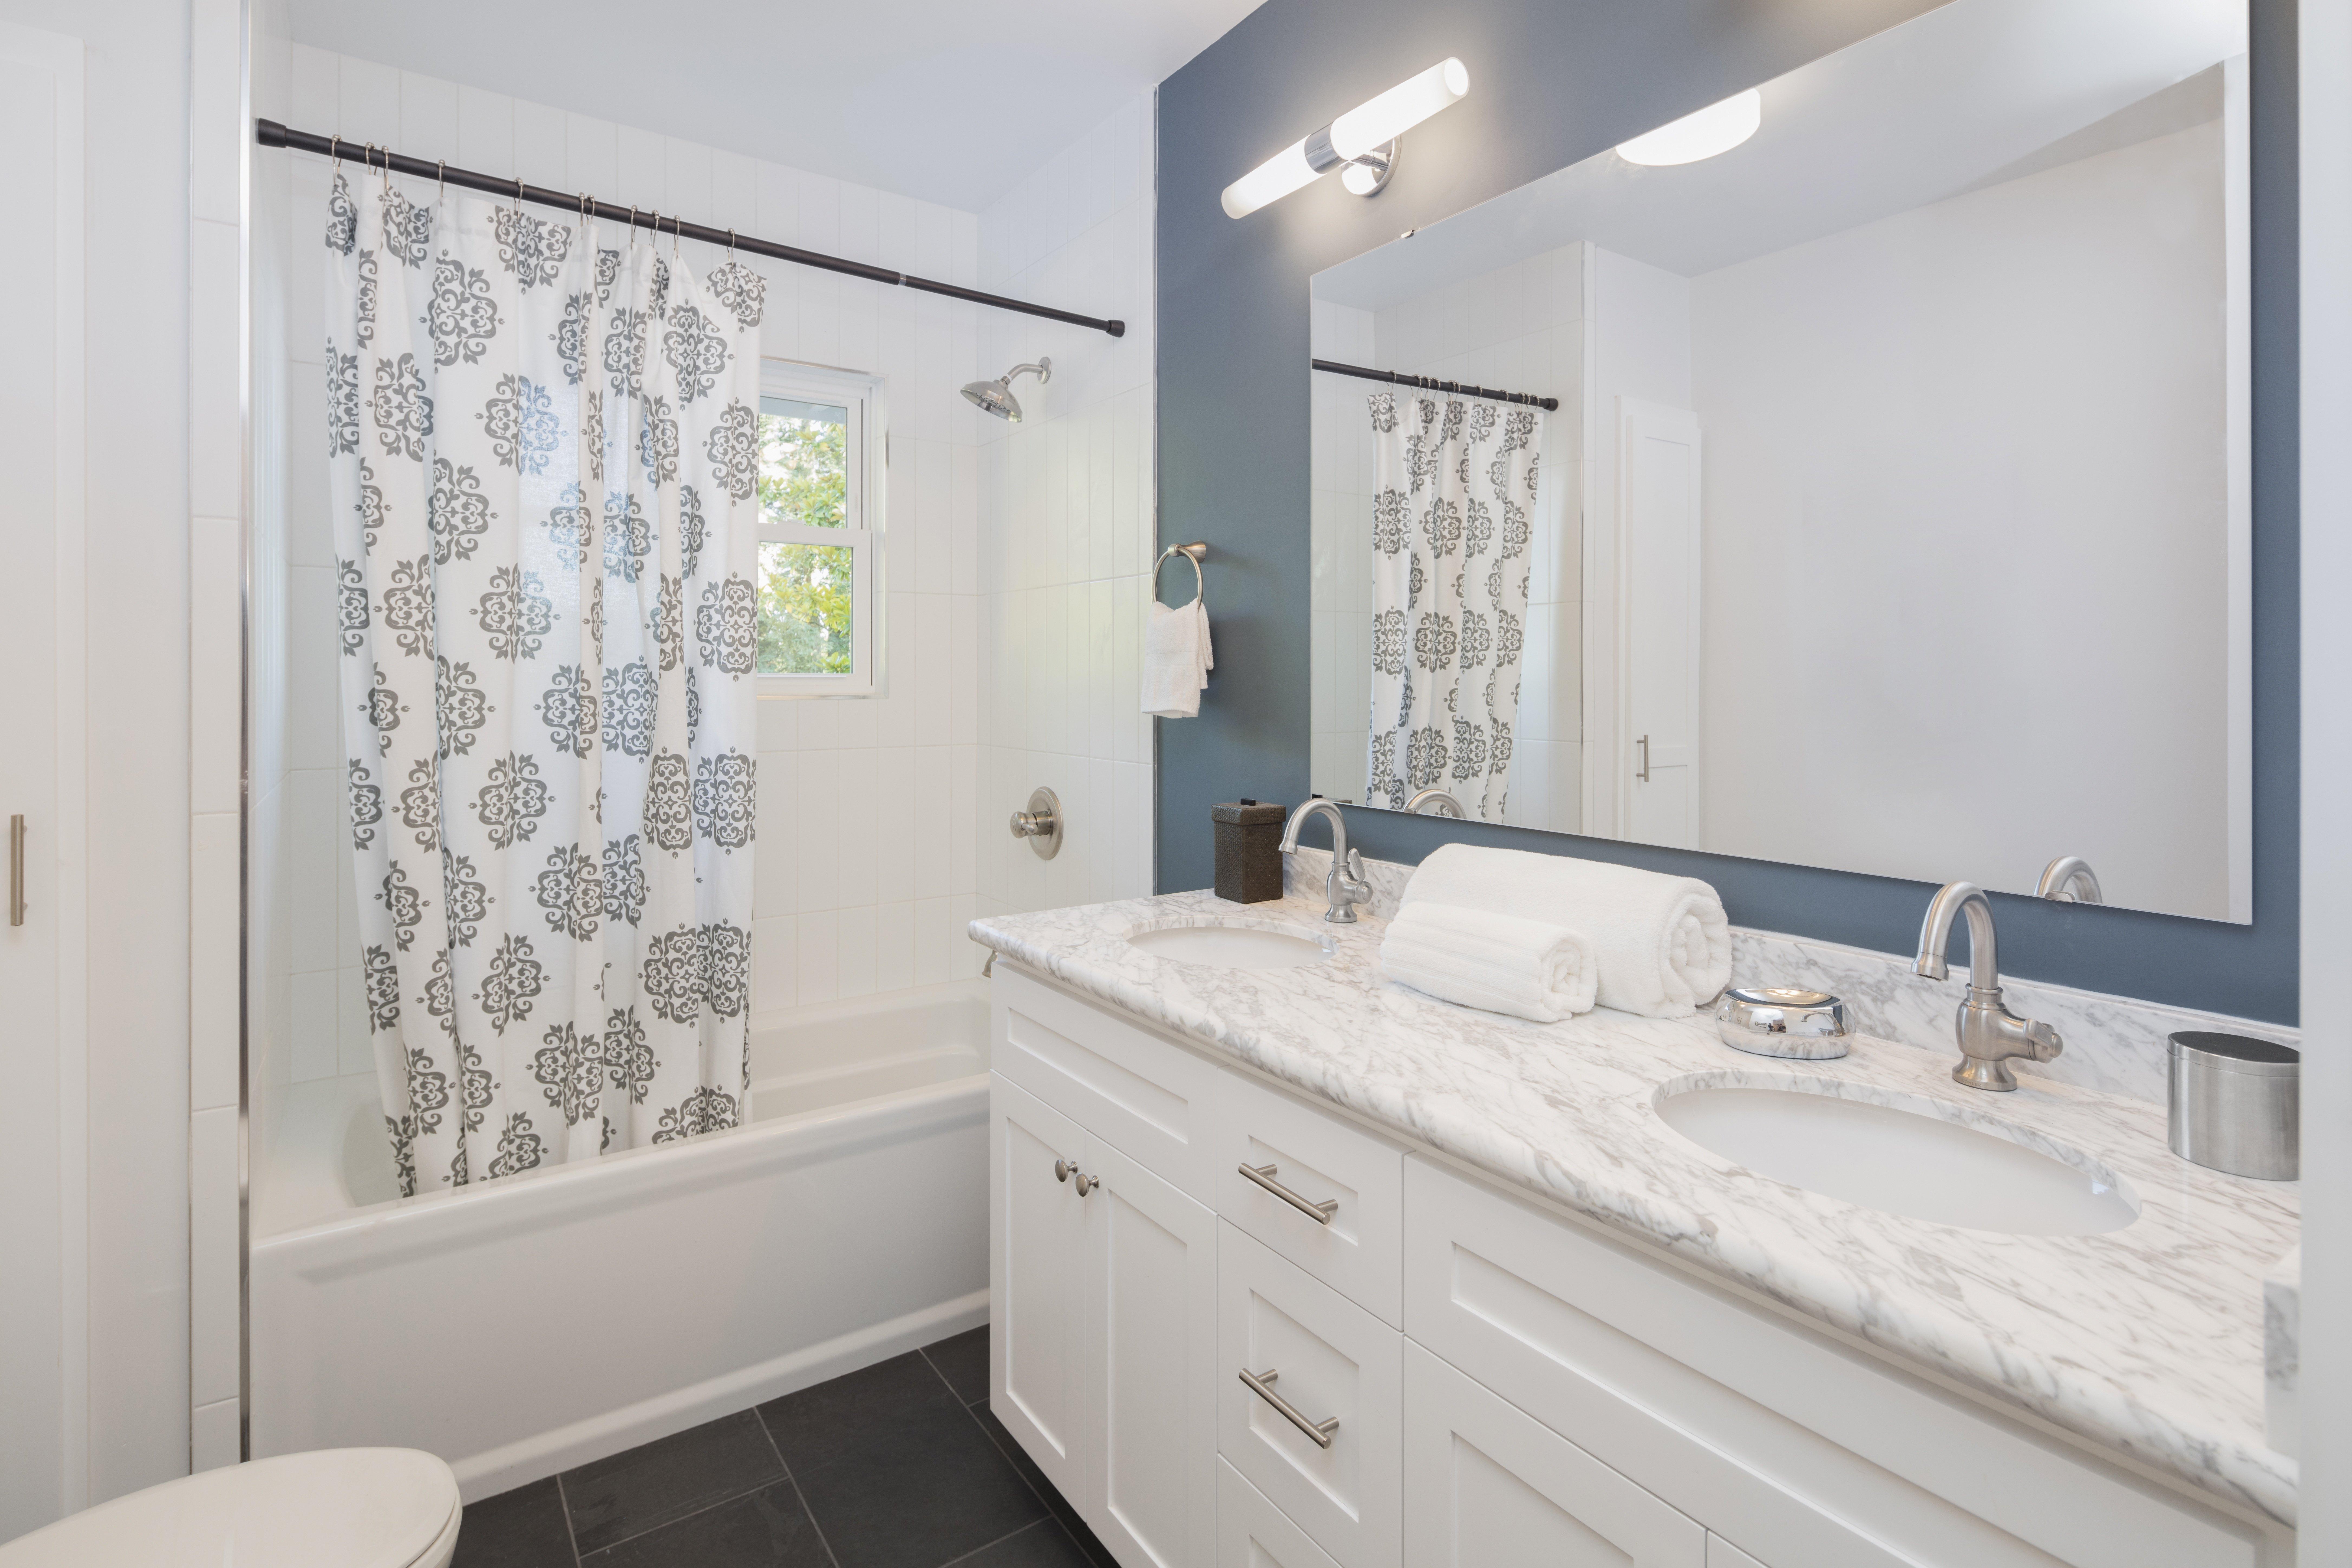 Tremendous Youve Got Maids House Cleaning Blog Bonney Lake Download Free Architecture Designs Scobabritishbridgeorg